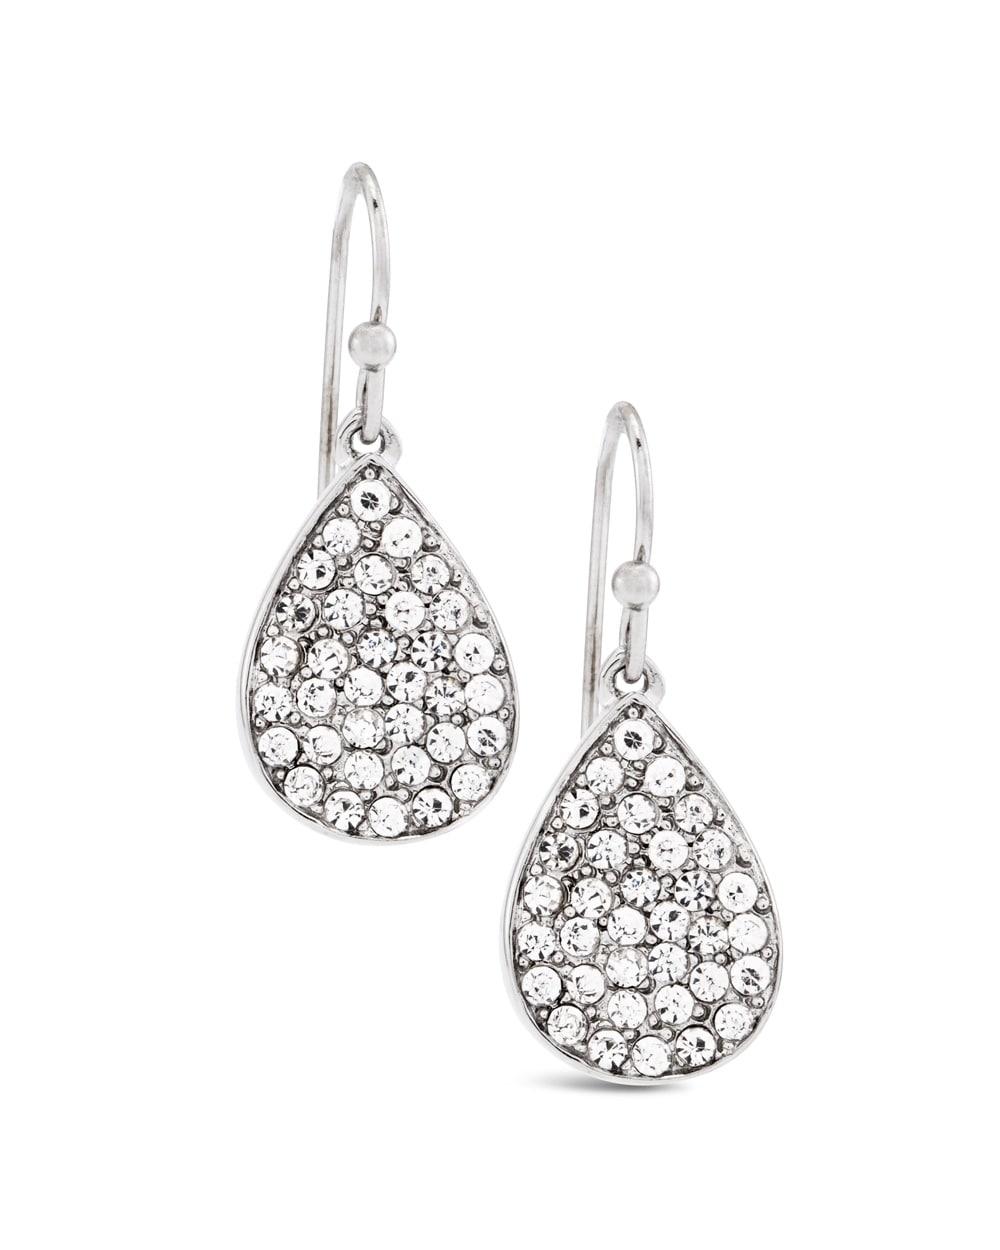 jewelry - show all